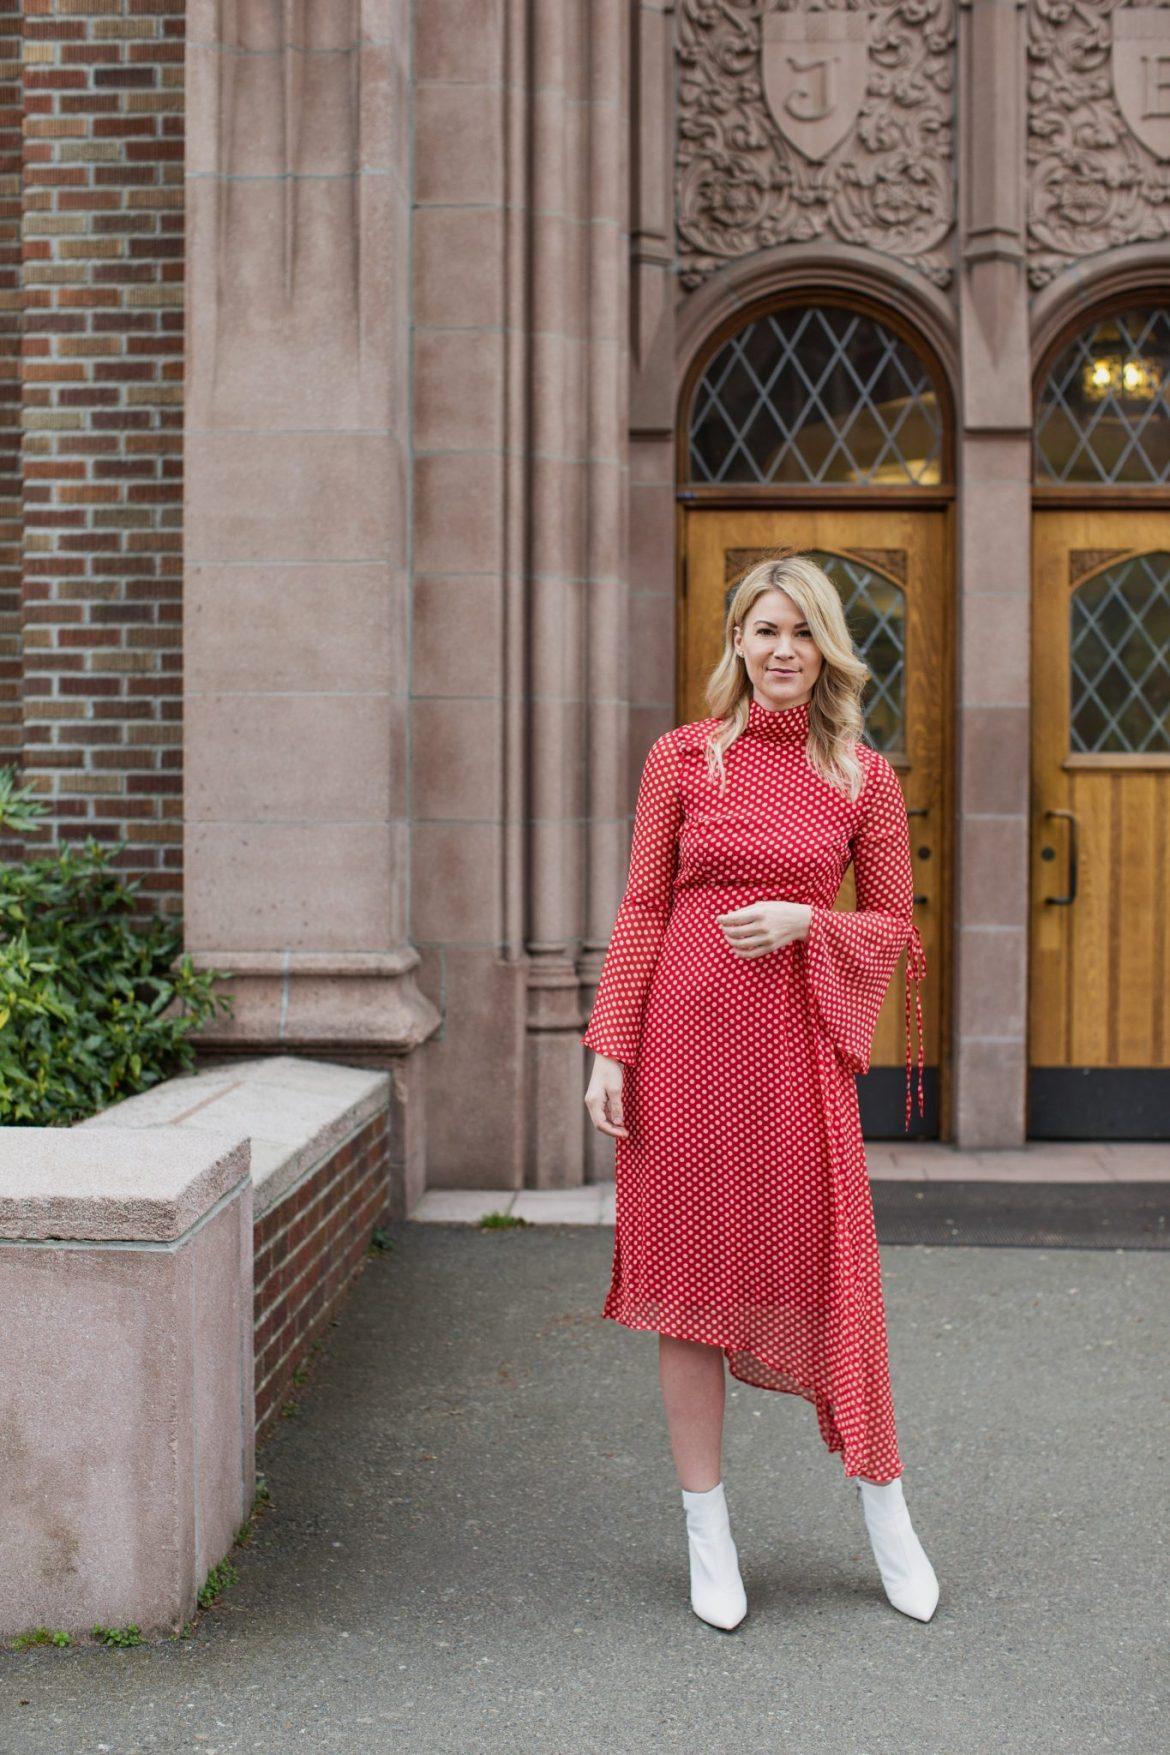 Asymmetrical Hemline ASOS dress